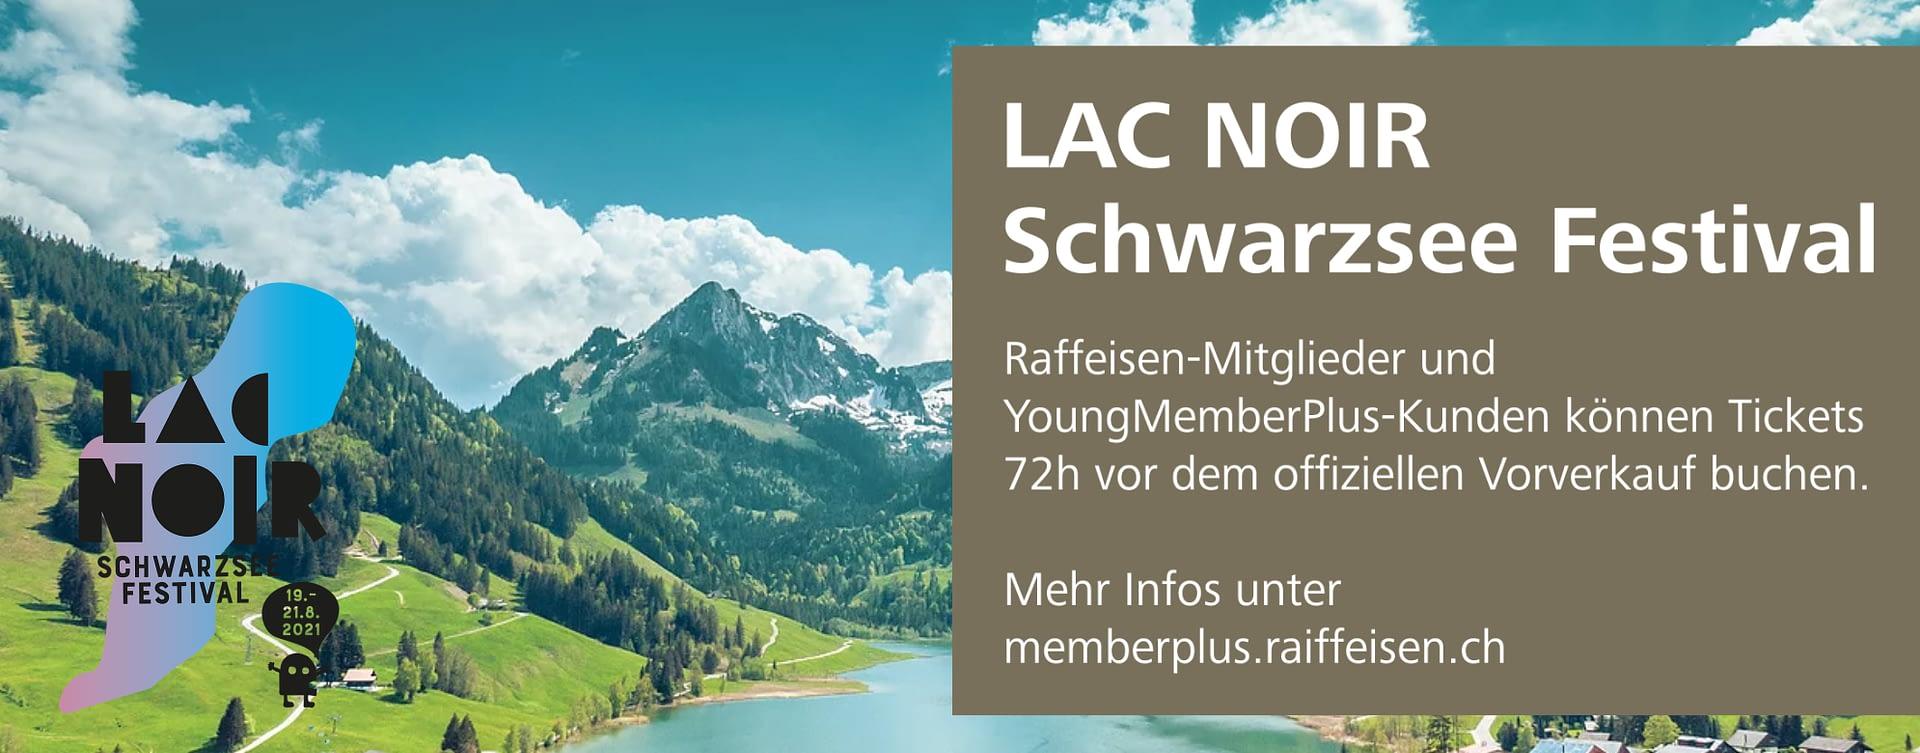 Raiffeisen tease: Schwarzsee Lac Noir Festival by STEMUTZ, 01.06.2021